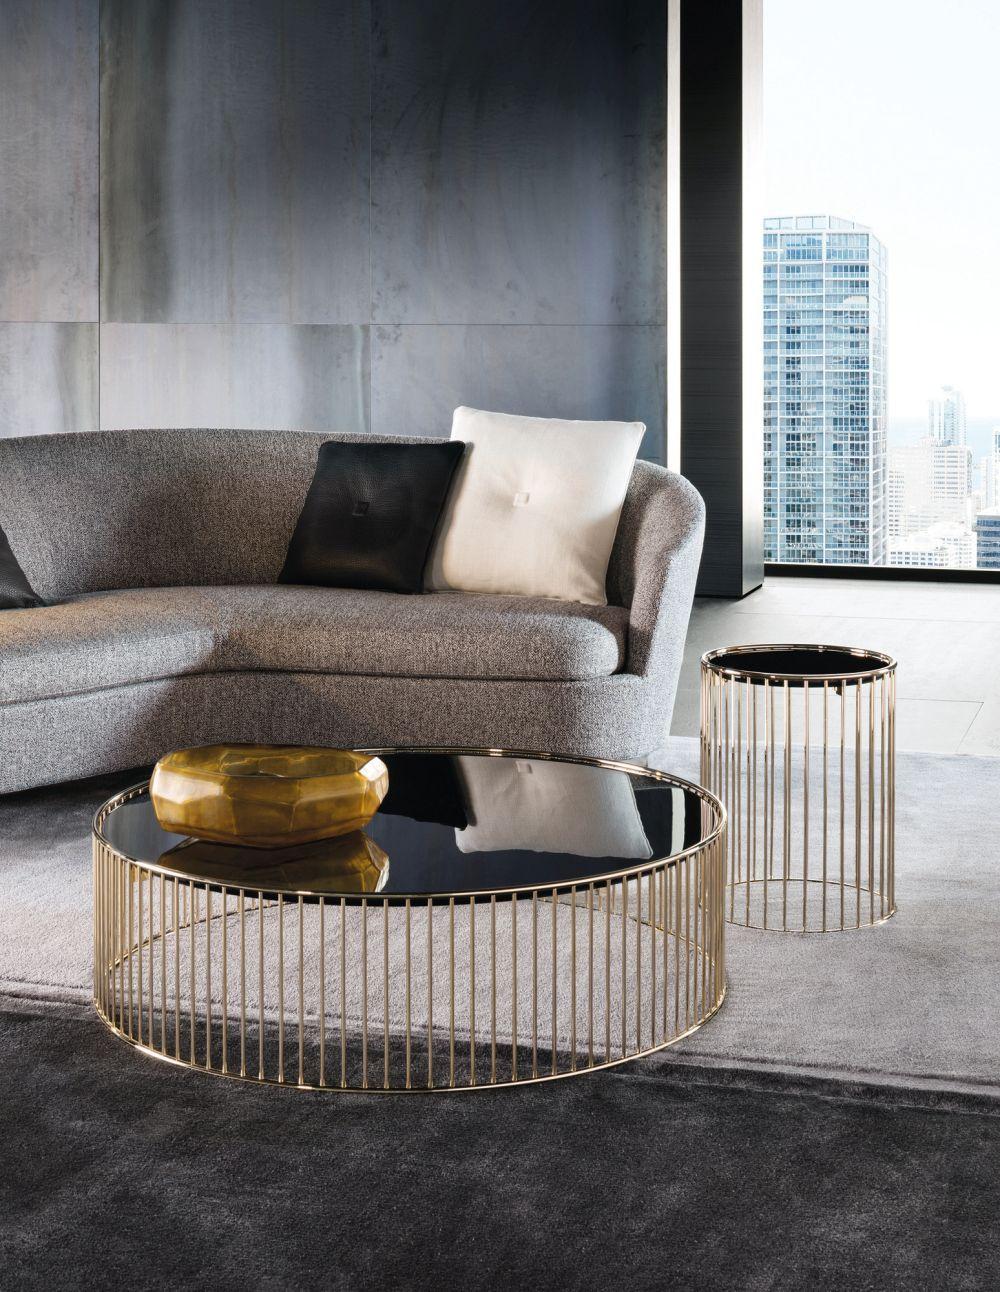 nesting table, black glass top, golden legs, grey rug, grey sofa